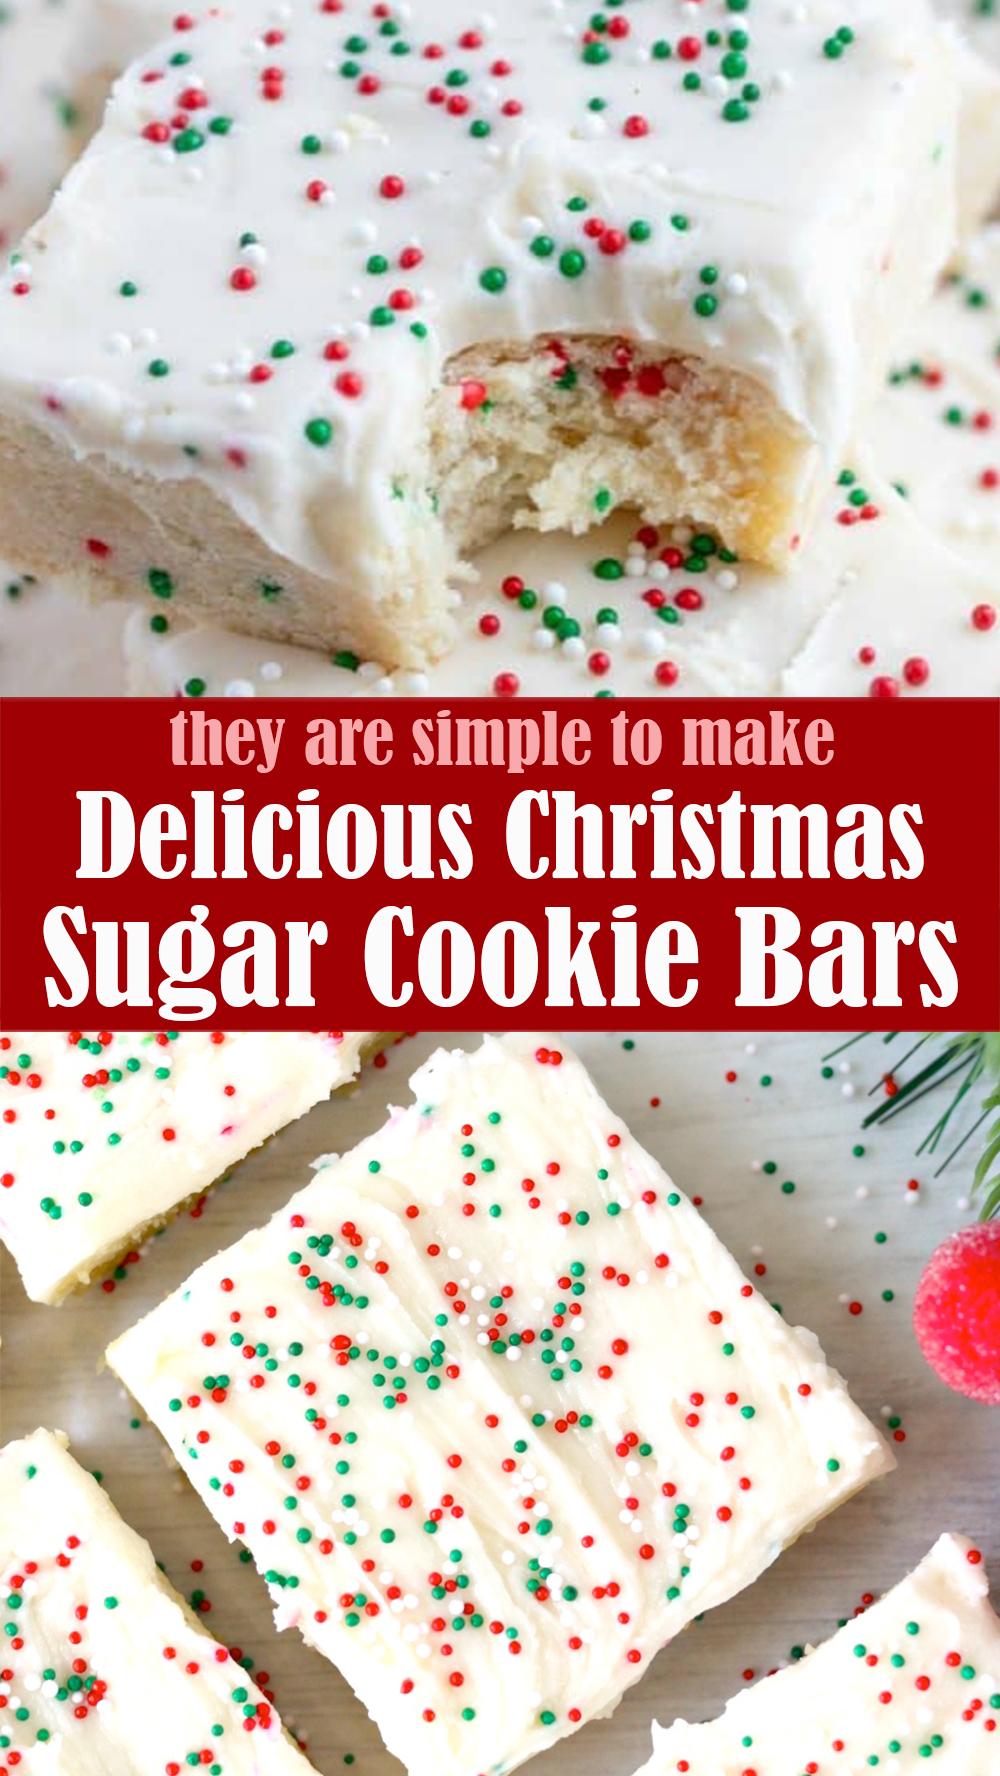 Delicious Christmas Sugar Cookie Bars